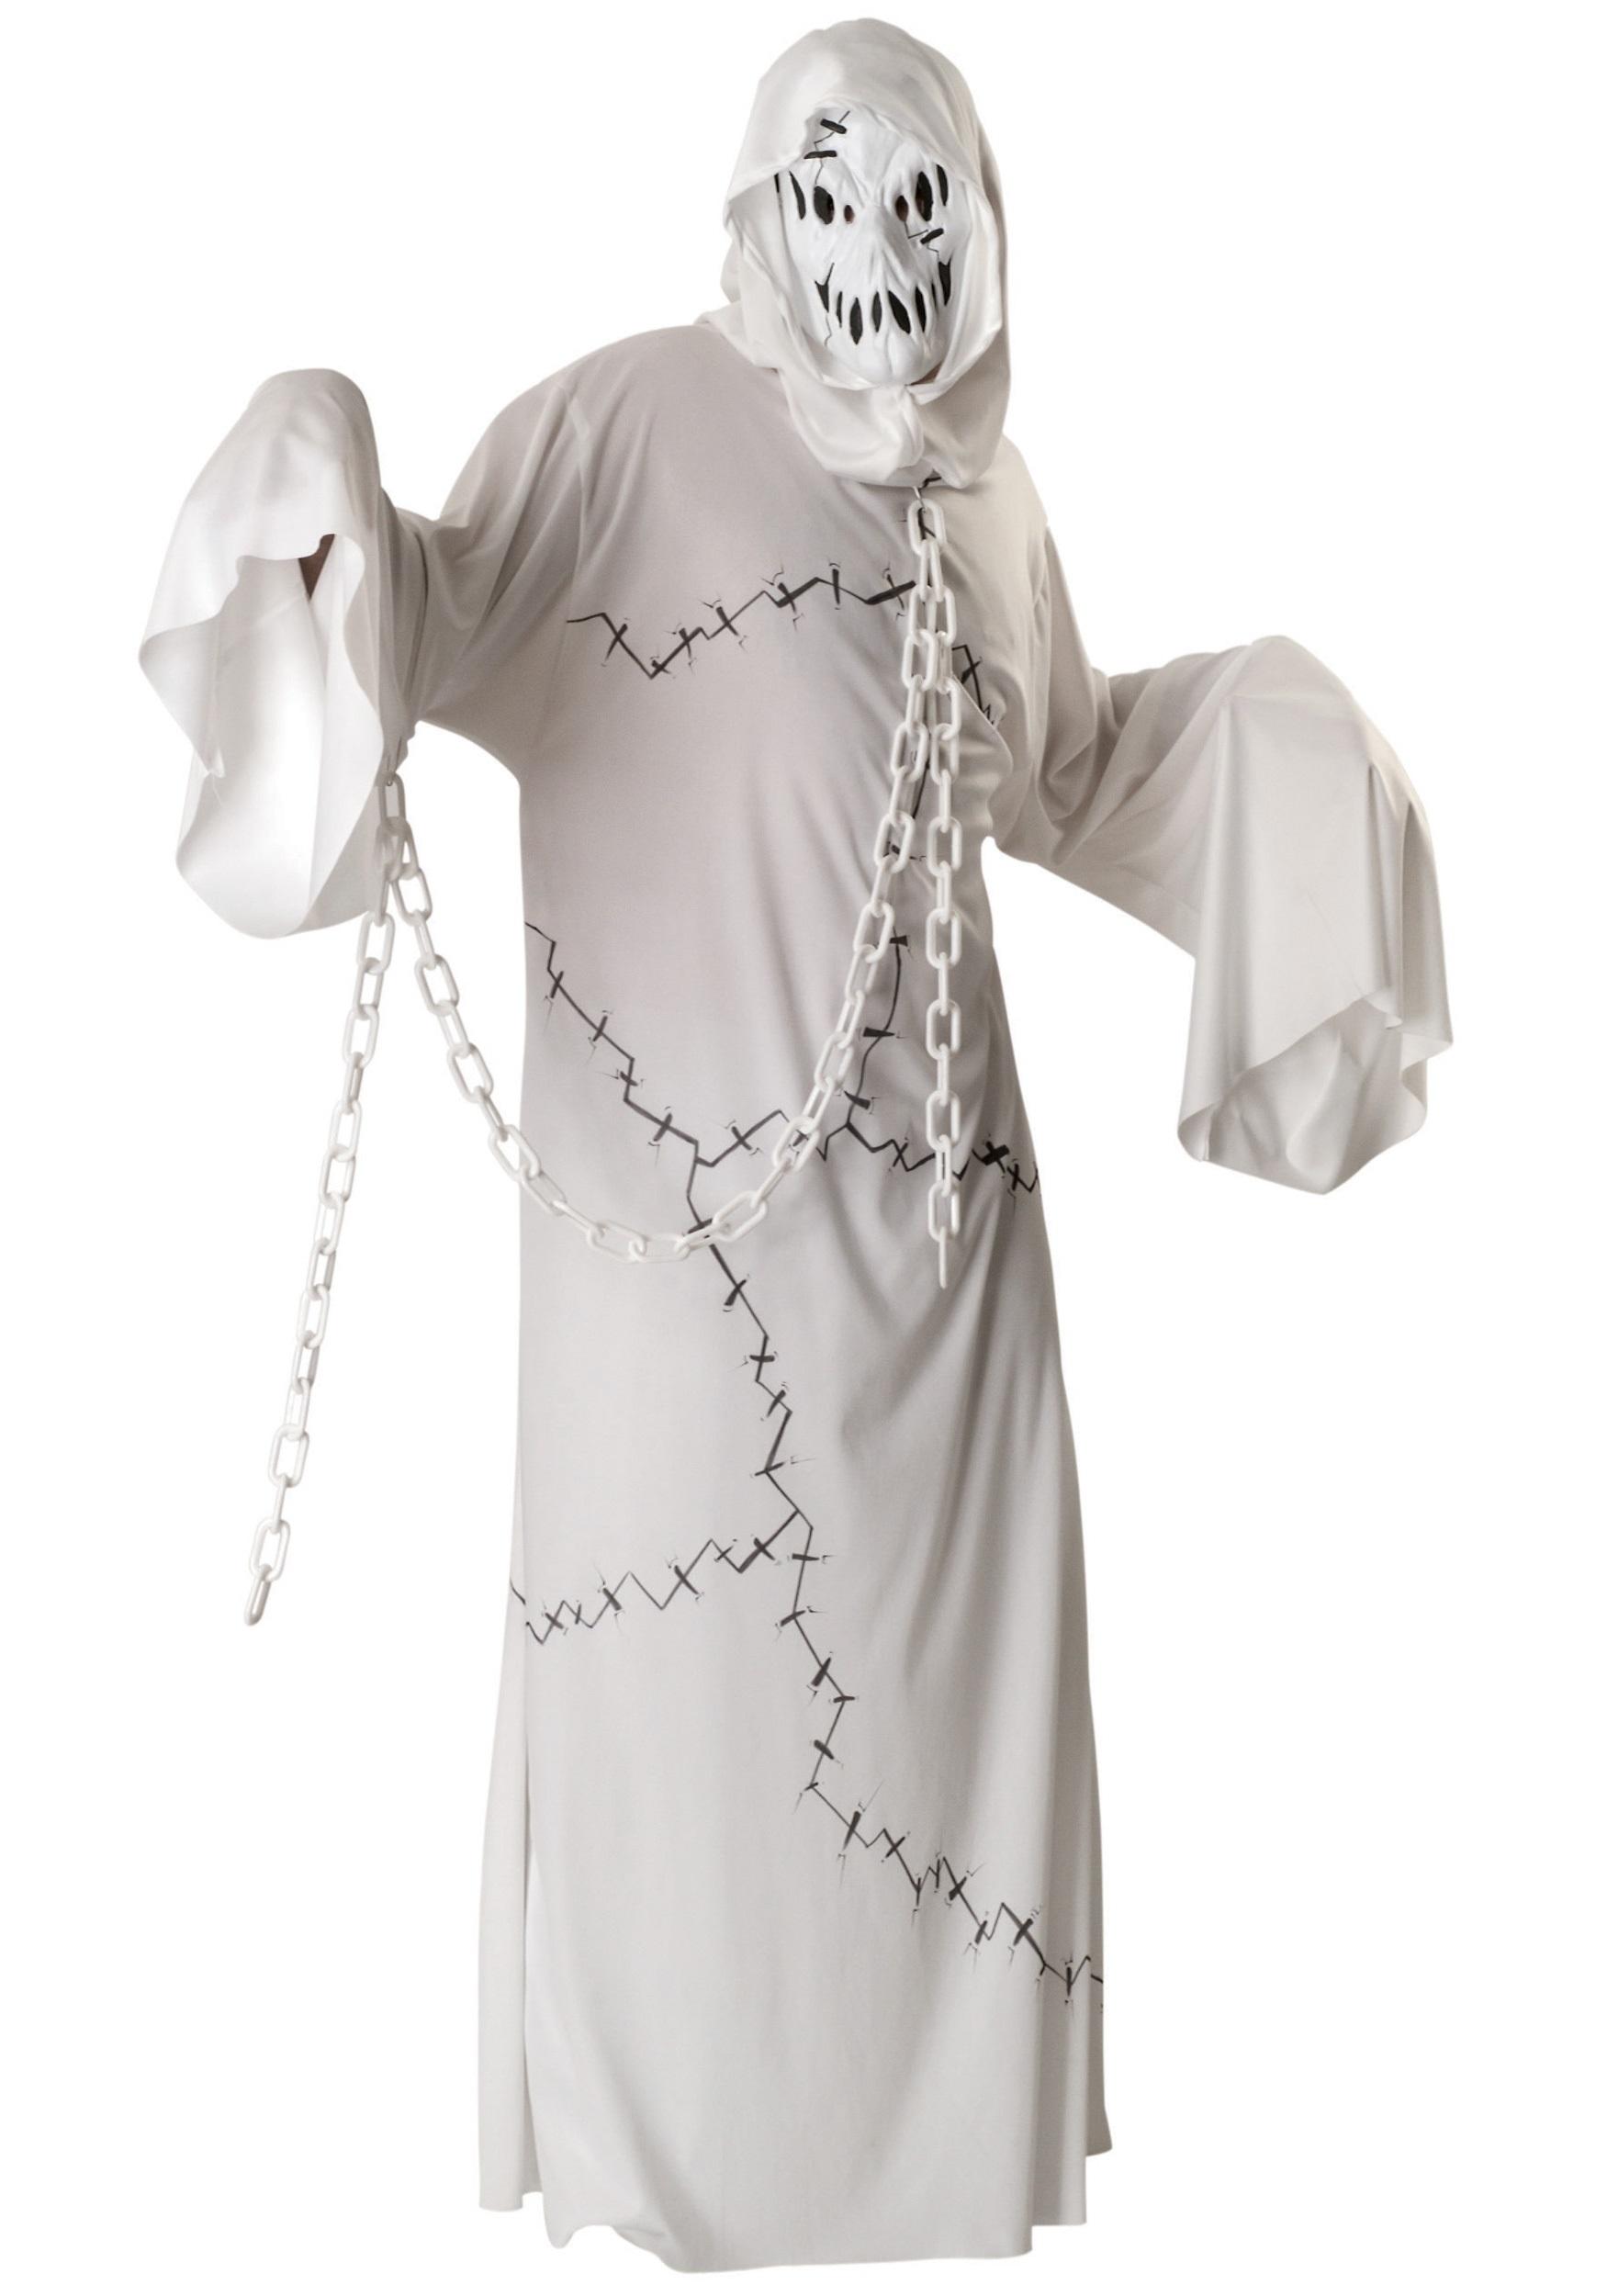 fb539cac53c Ghost Costumes - Adult